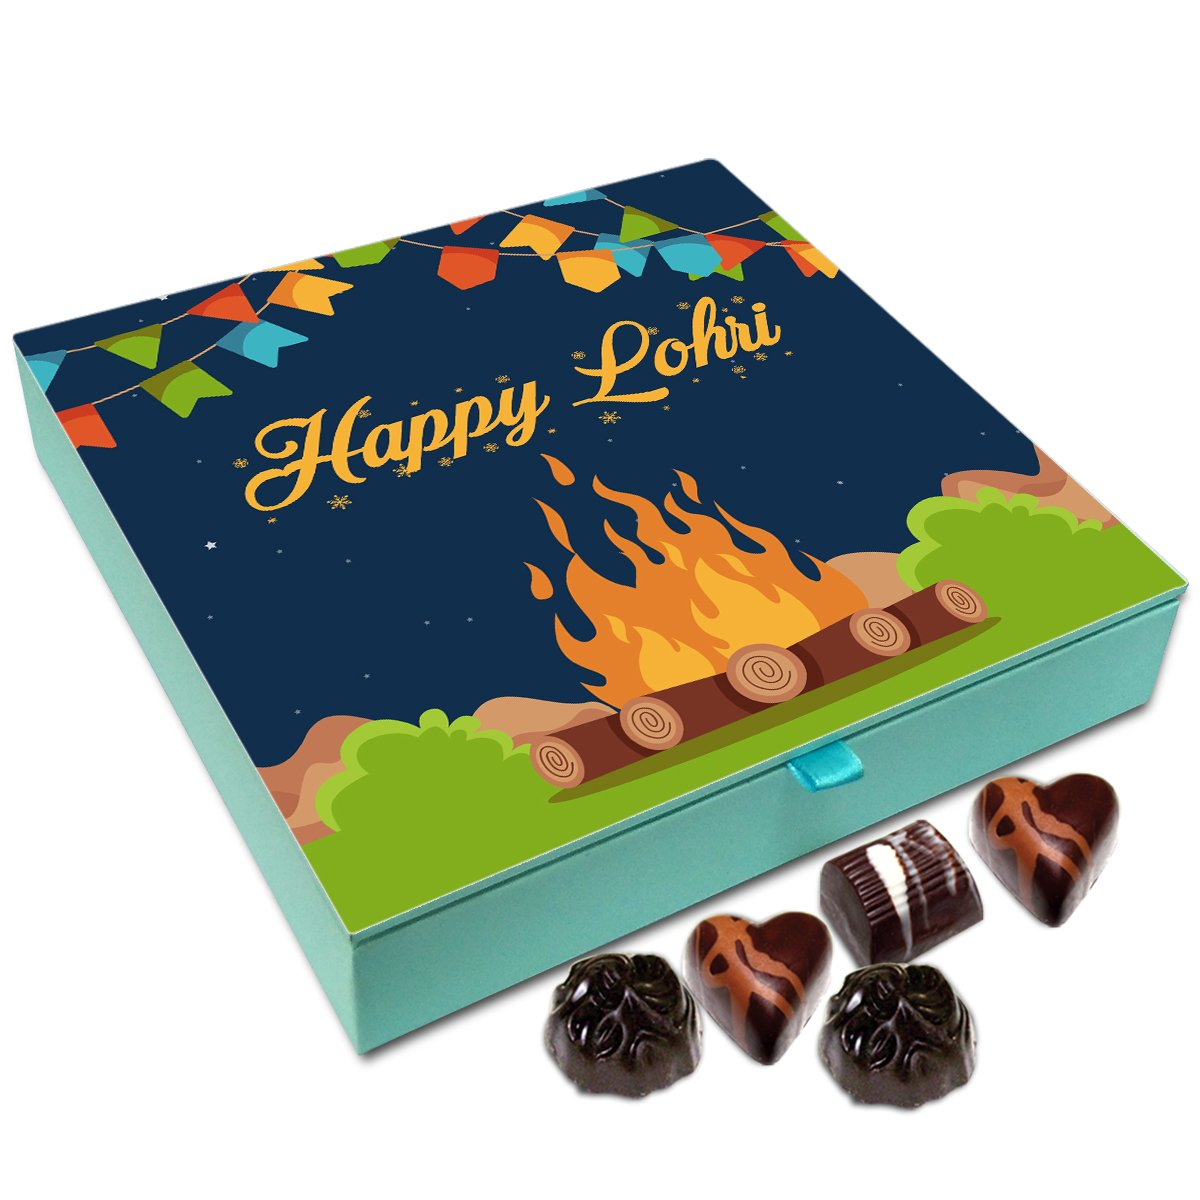 Chocholik Lohri Gift Box – Happy Lohri to All Chocolate Box – 9pc